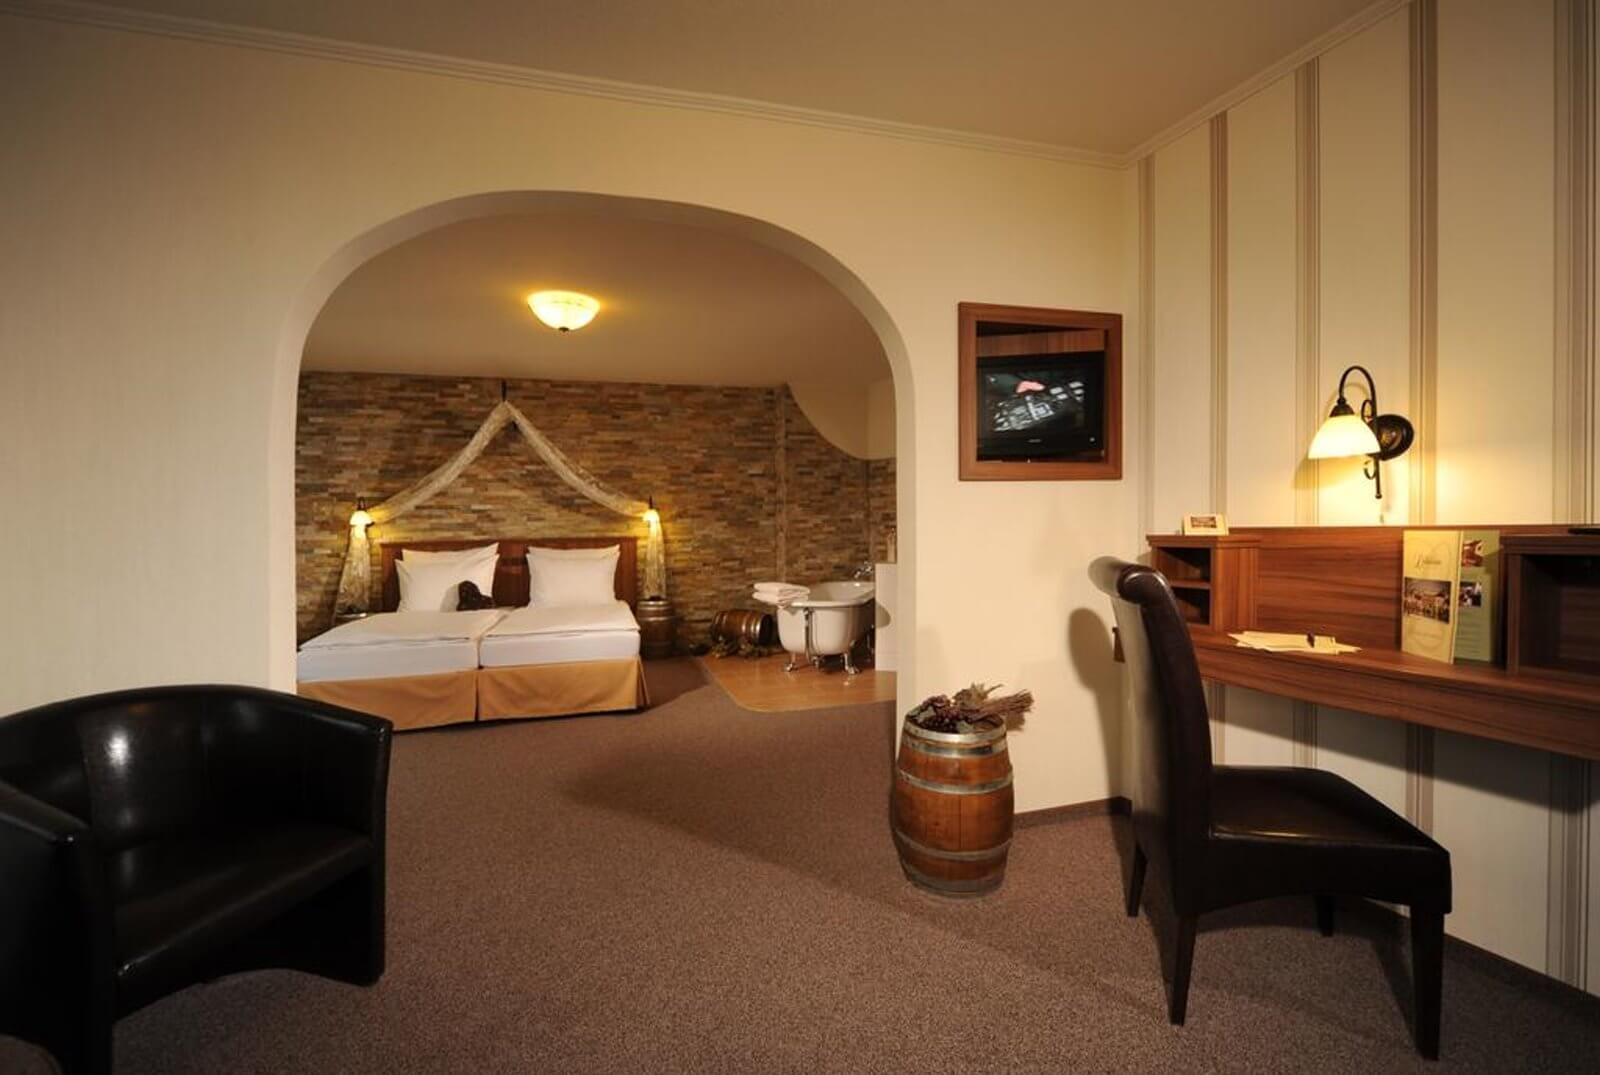 champagner-suite-hotel-an-der-mosel-moseltal-loef-lellmann